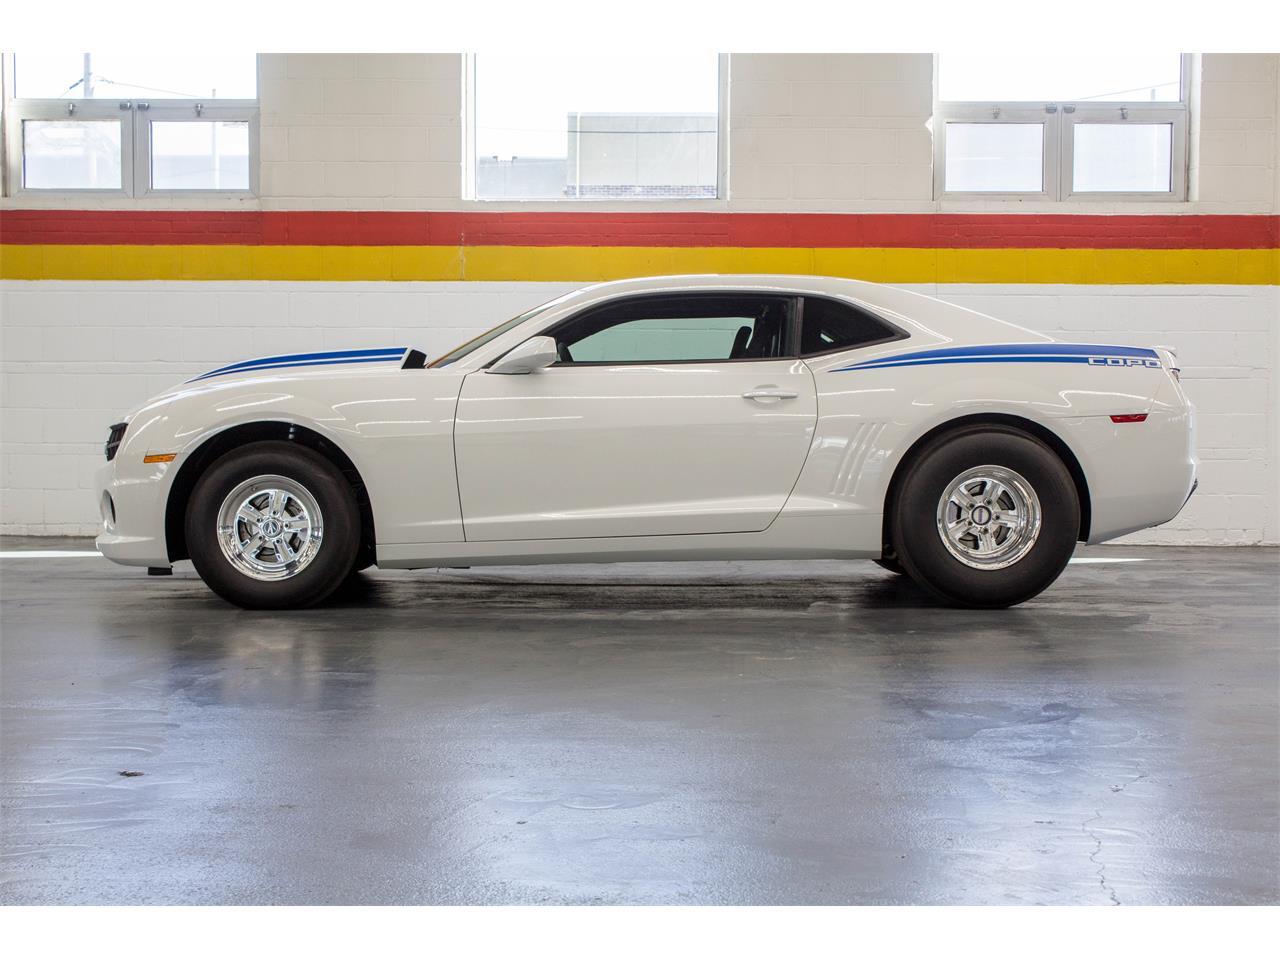 Copo Camaro For Sale >> 2012 Chevrolet Camaro Copo For Sale Classiccars Com Cc 1101917